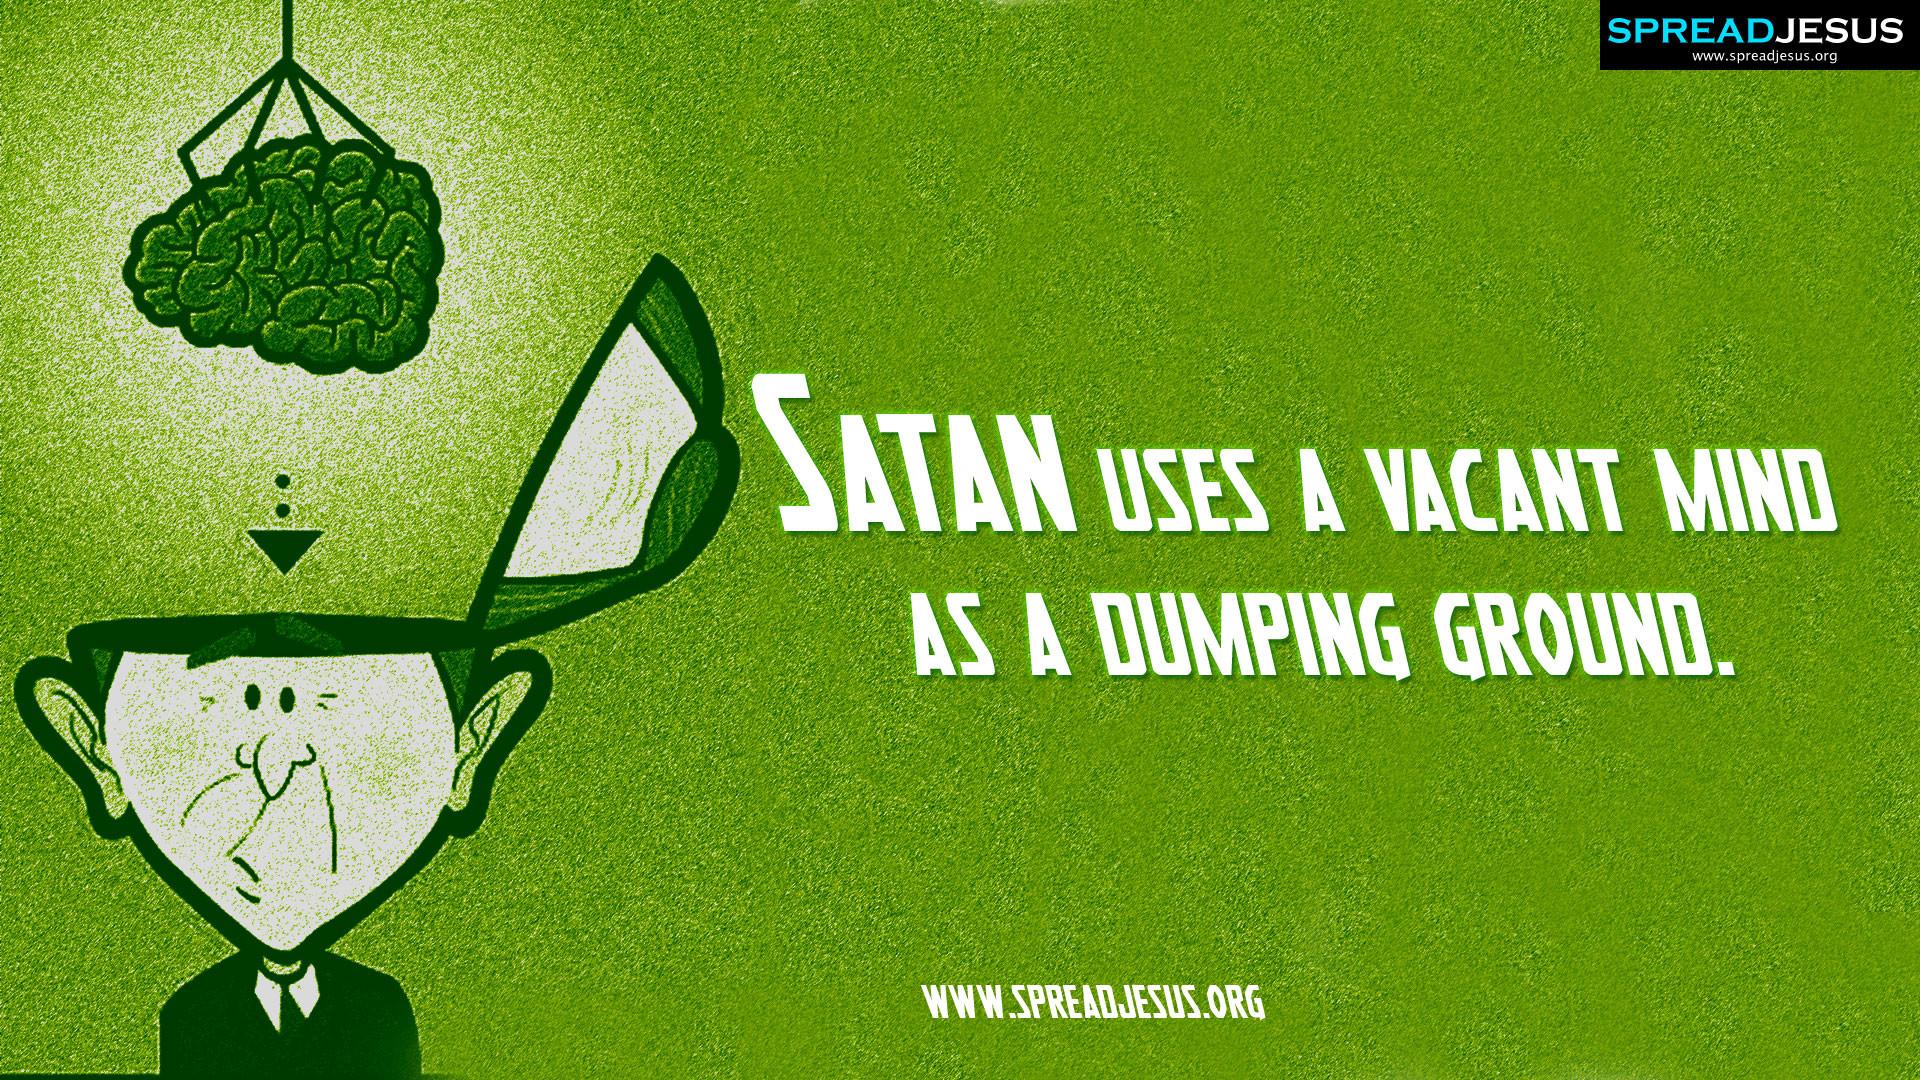 Satan uses a vacant mind